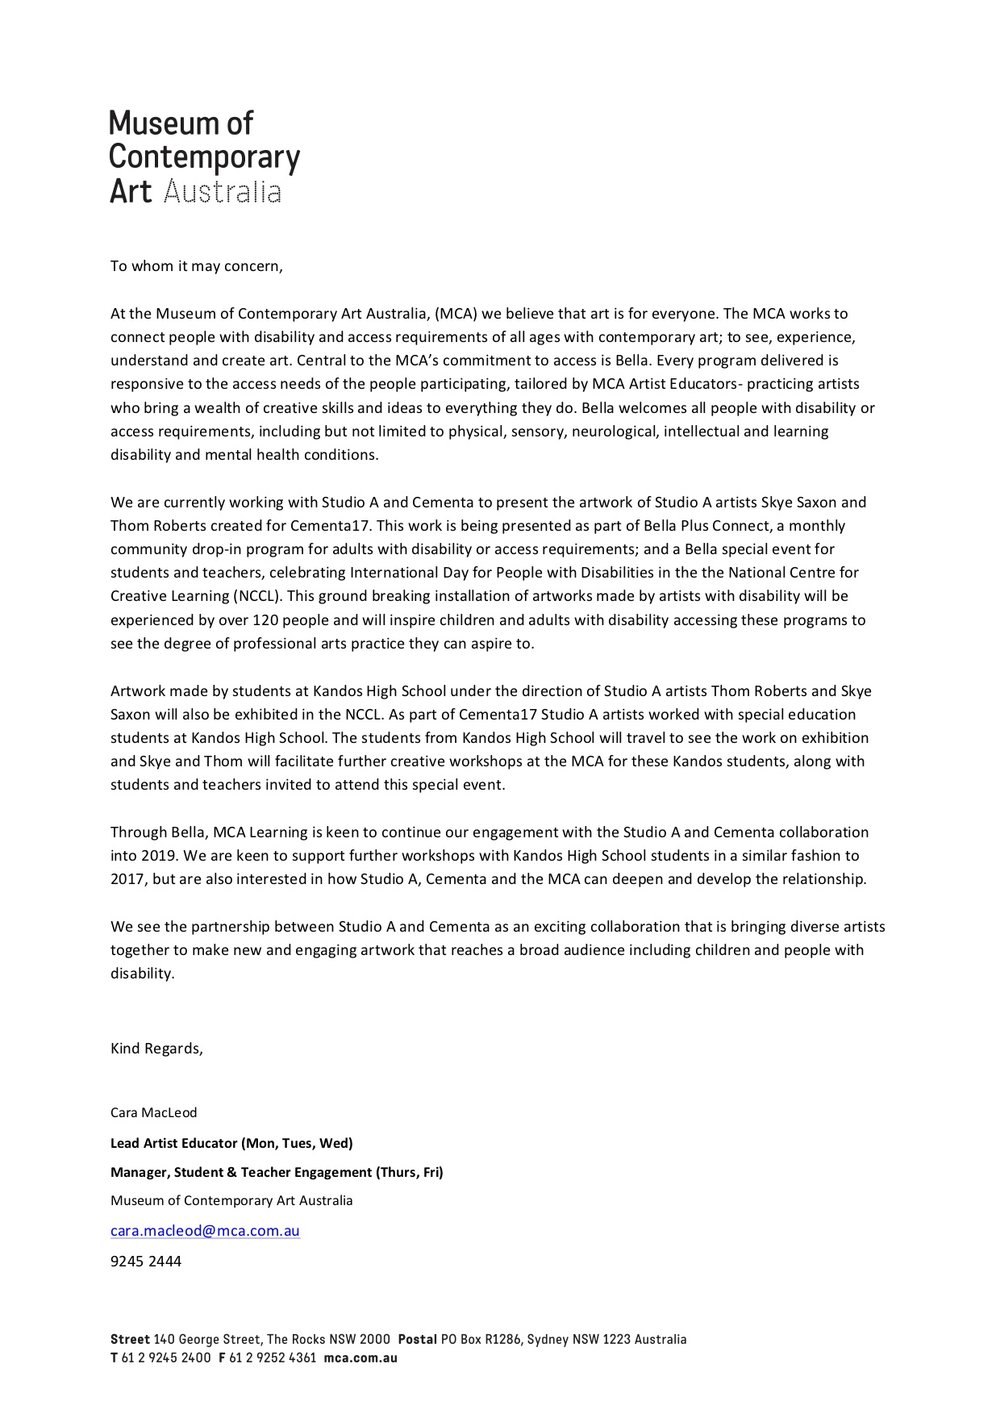 Letter of Support Studio A Cementa Jan 2018_MCA.jpg